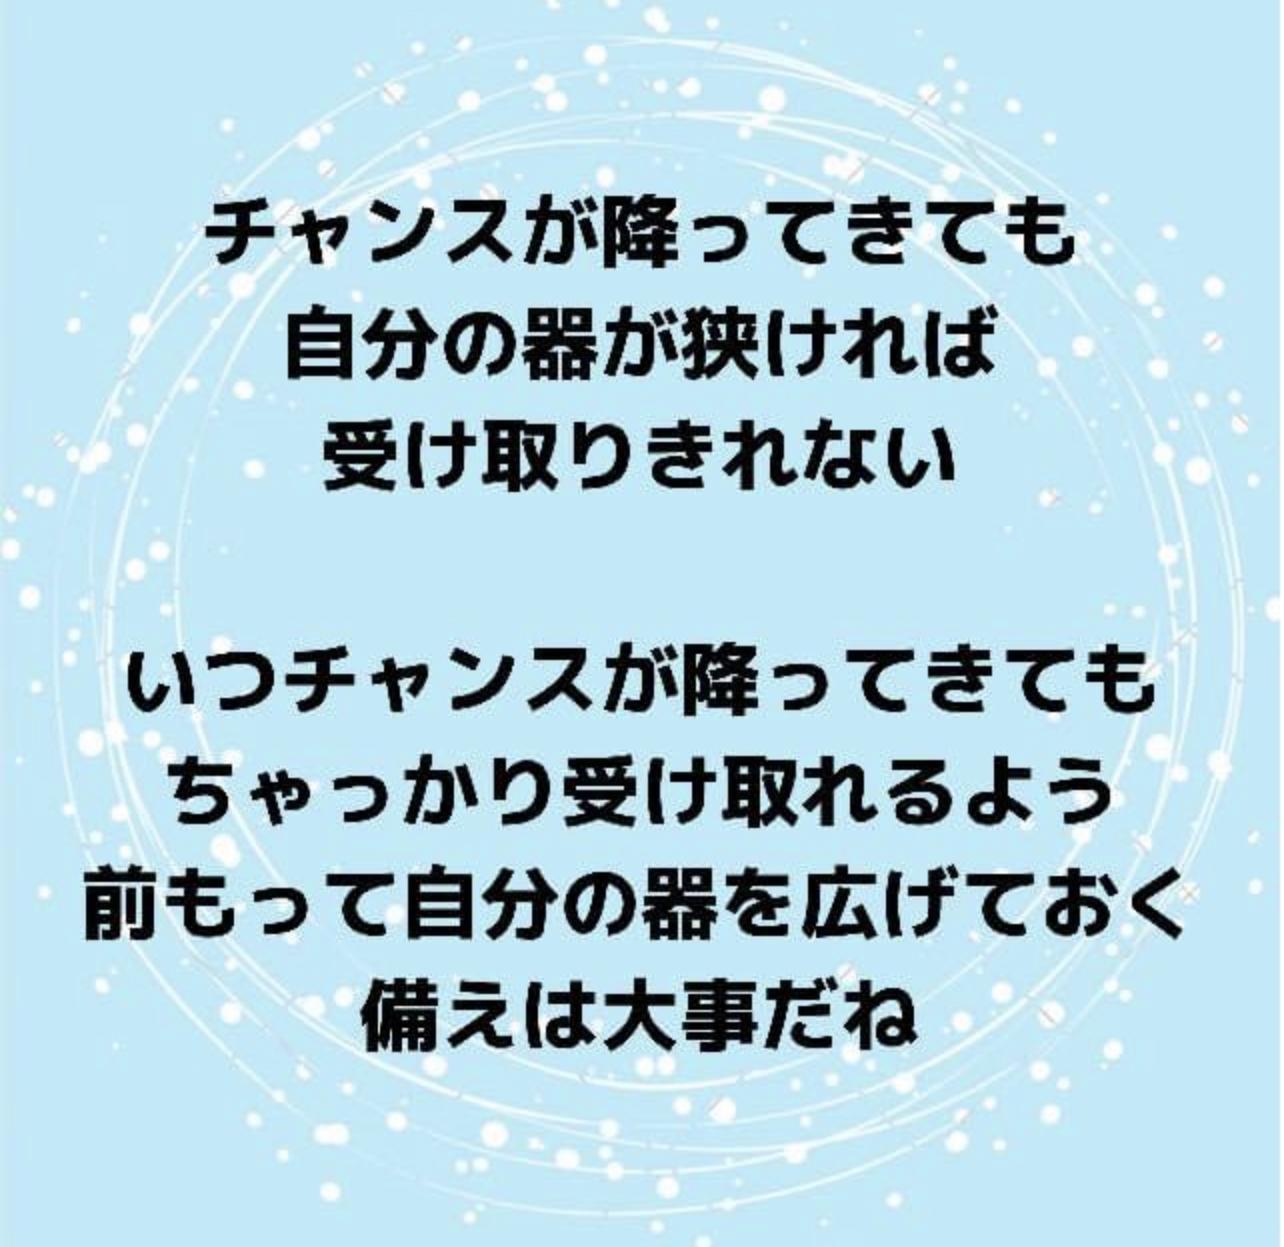 02D73F24-112F-4073-98A9-0DB01BD34E47